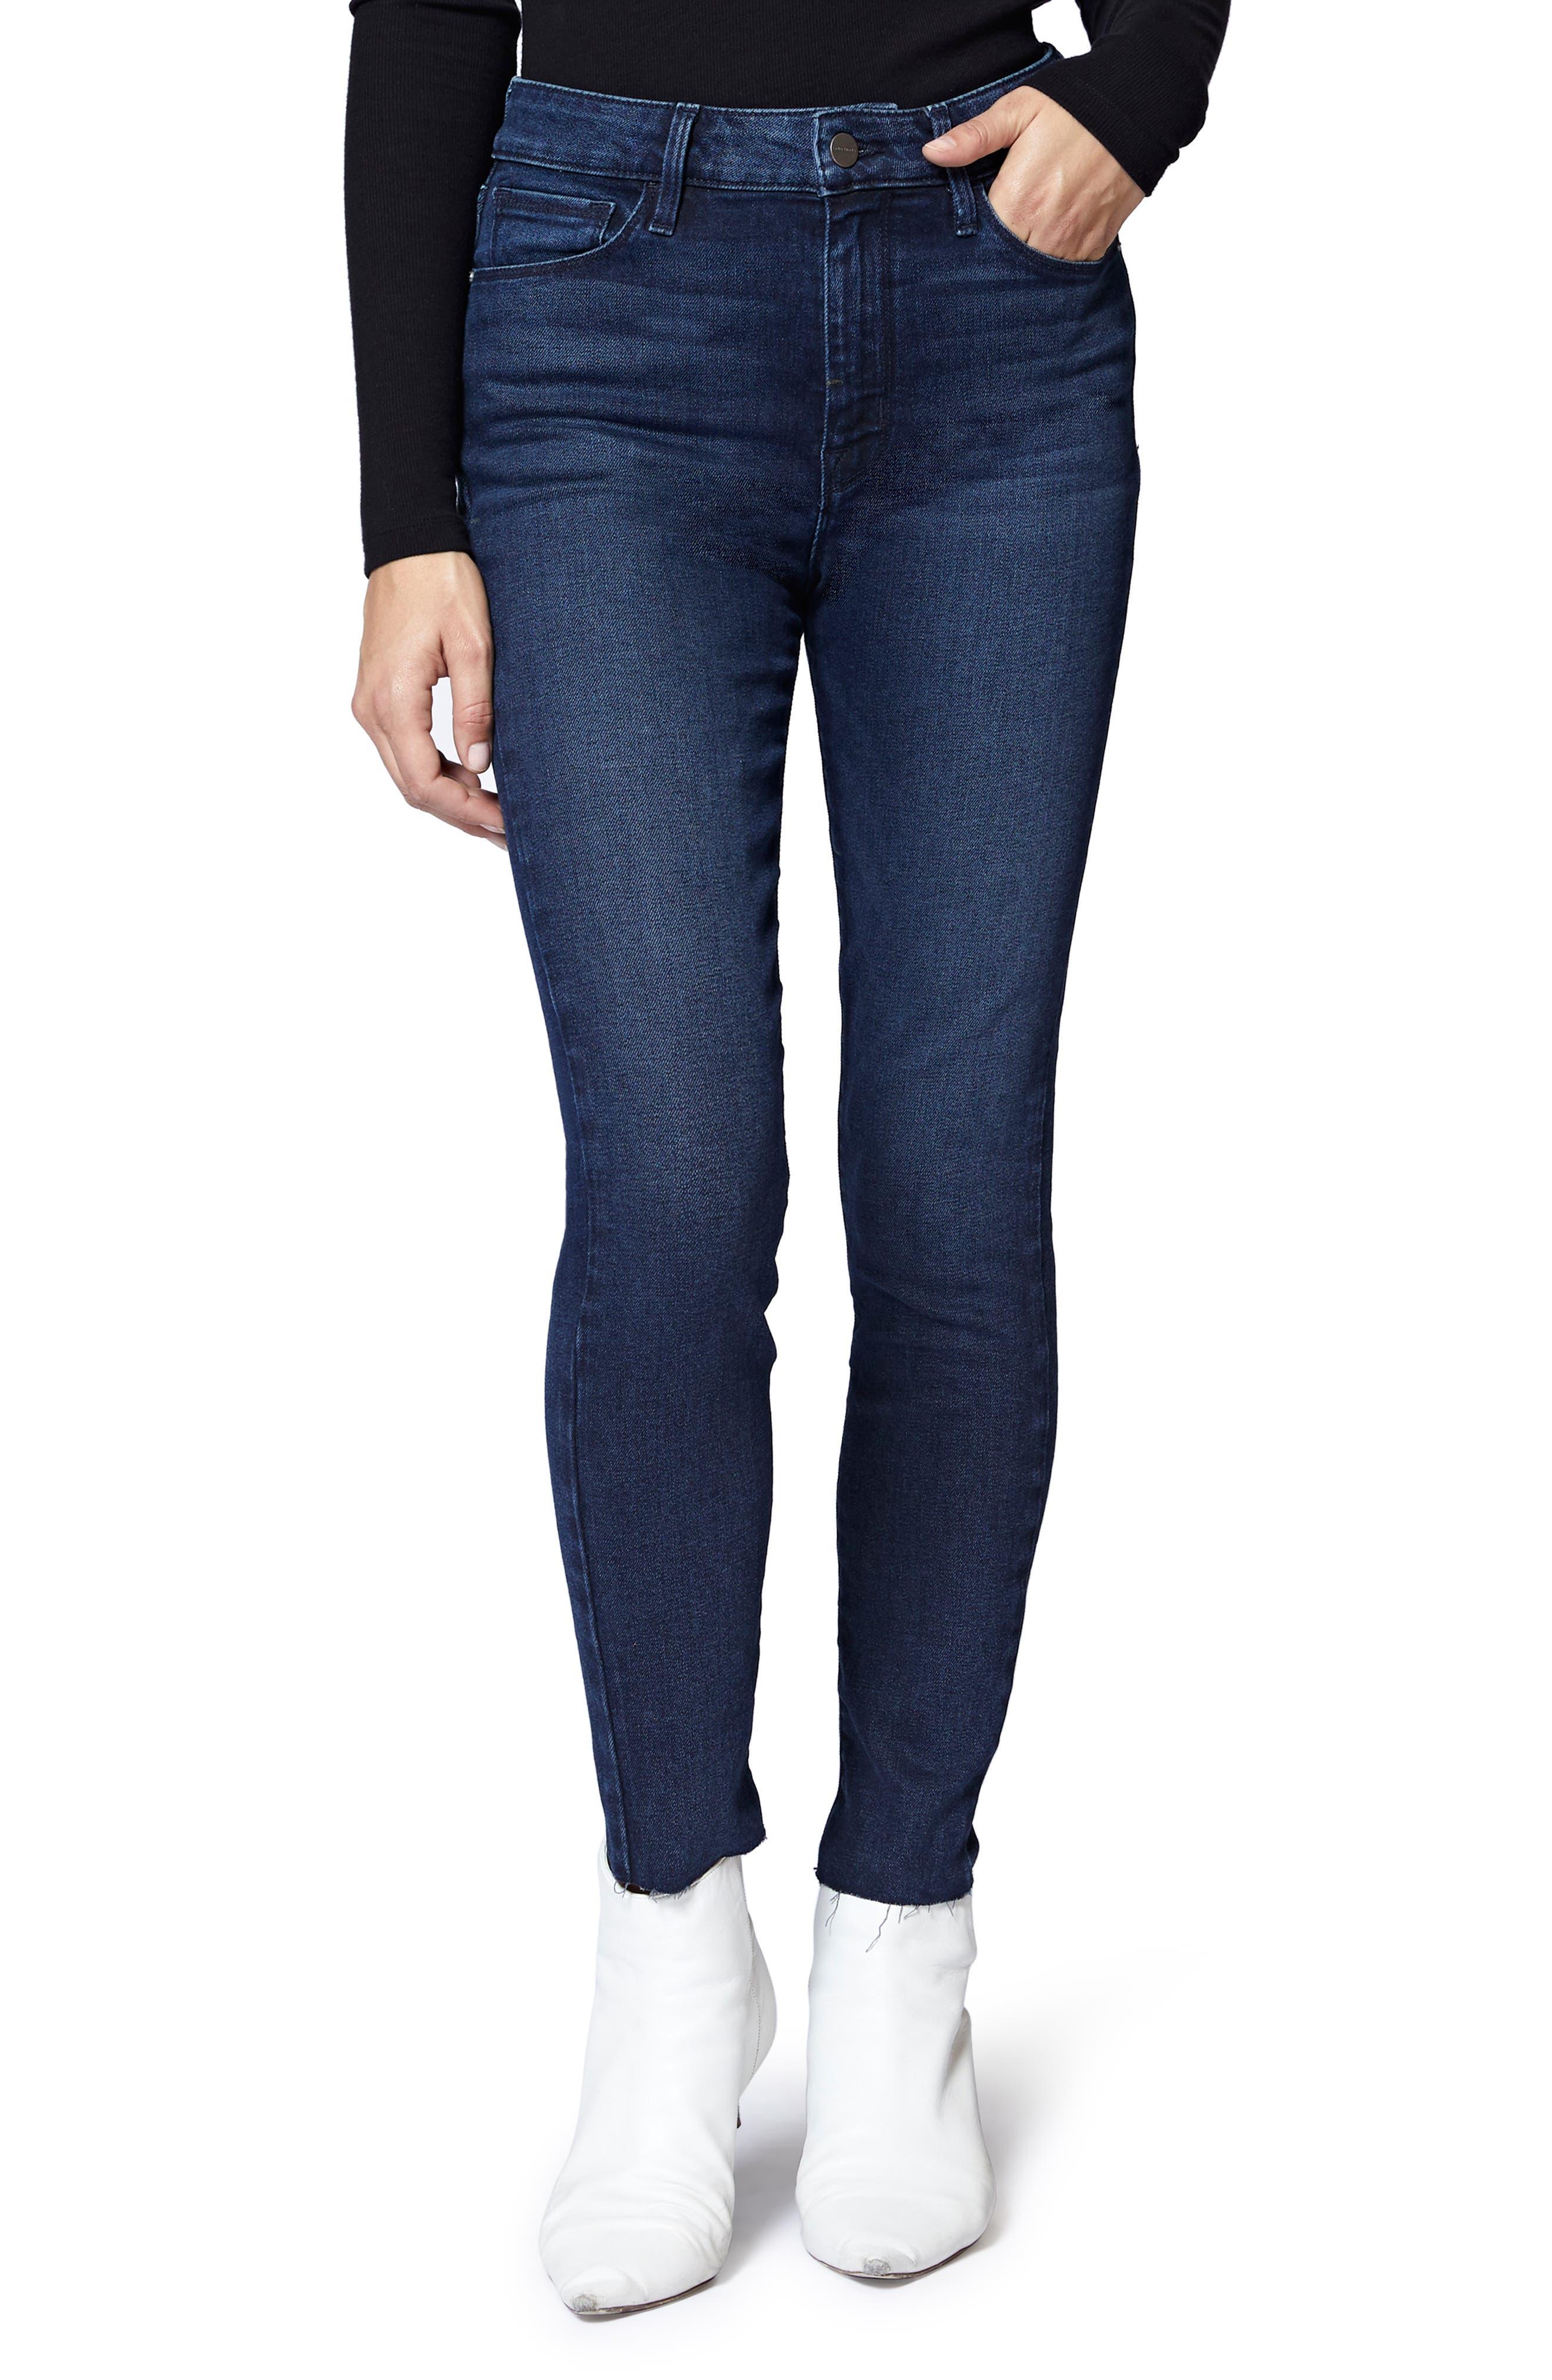 SANCTUARY,                             Social High Rise Raw Hem Skinny Ankle Jeans,                             Main thumbnail 1, color,                             401